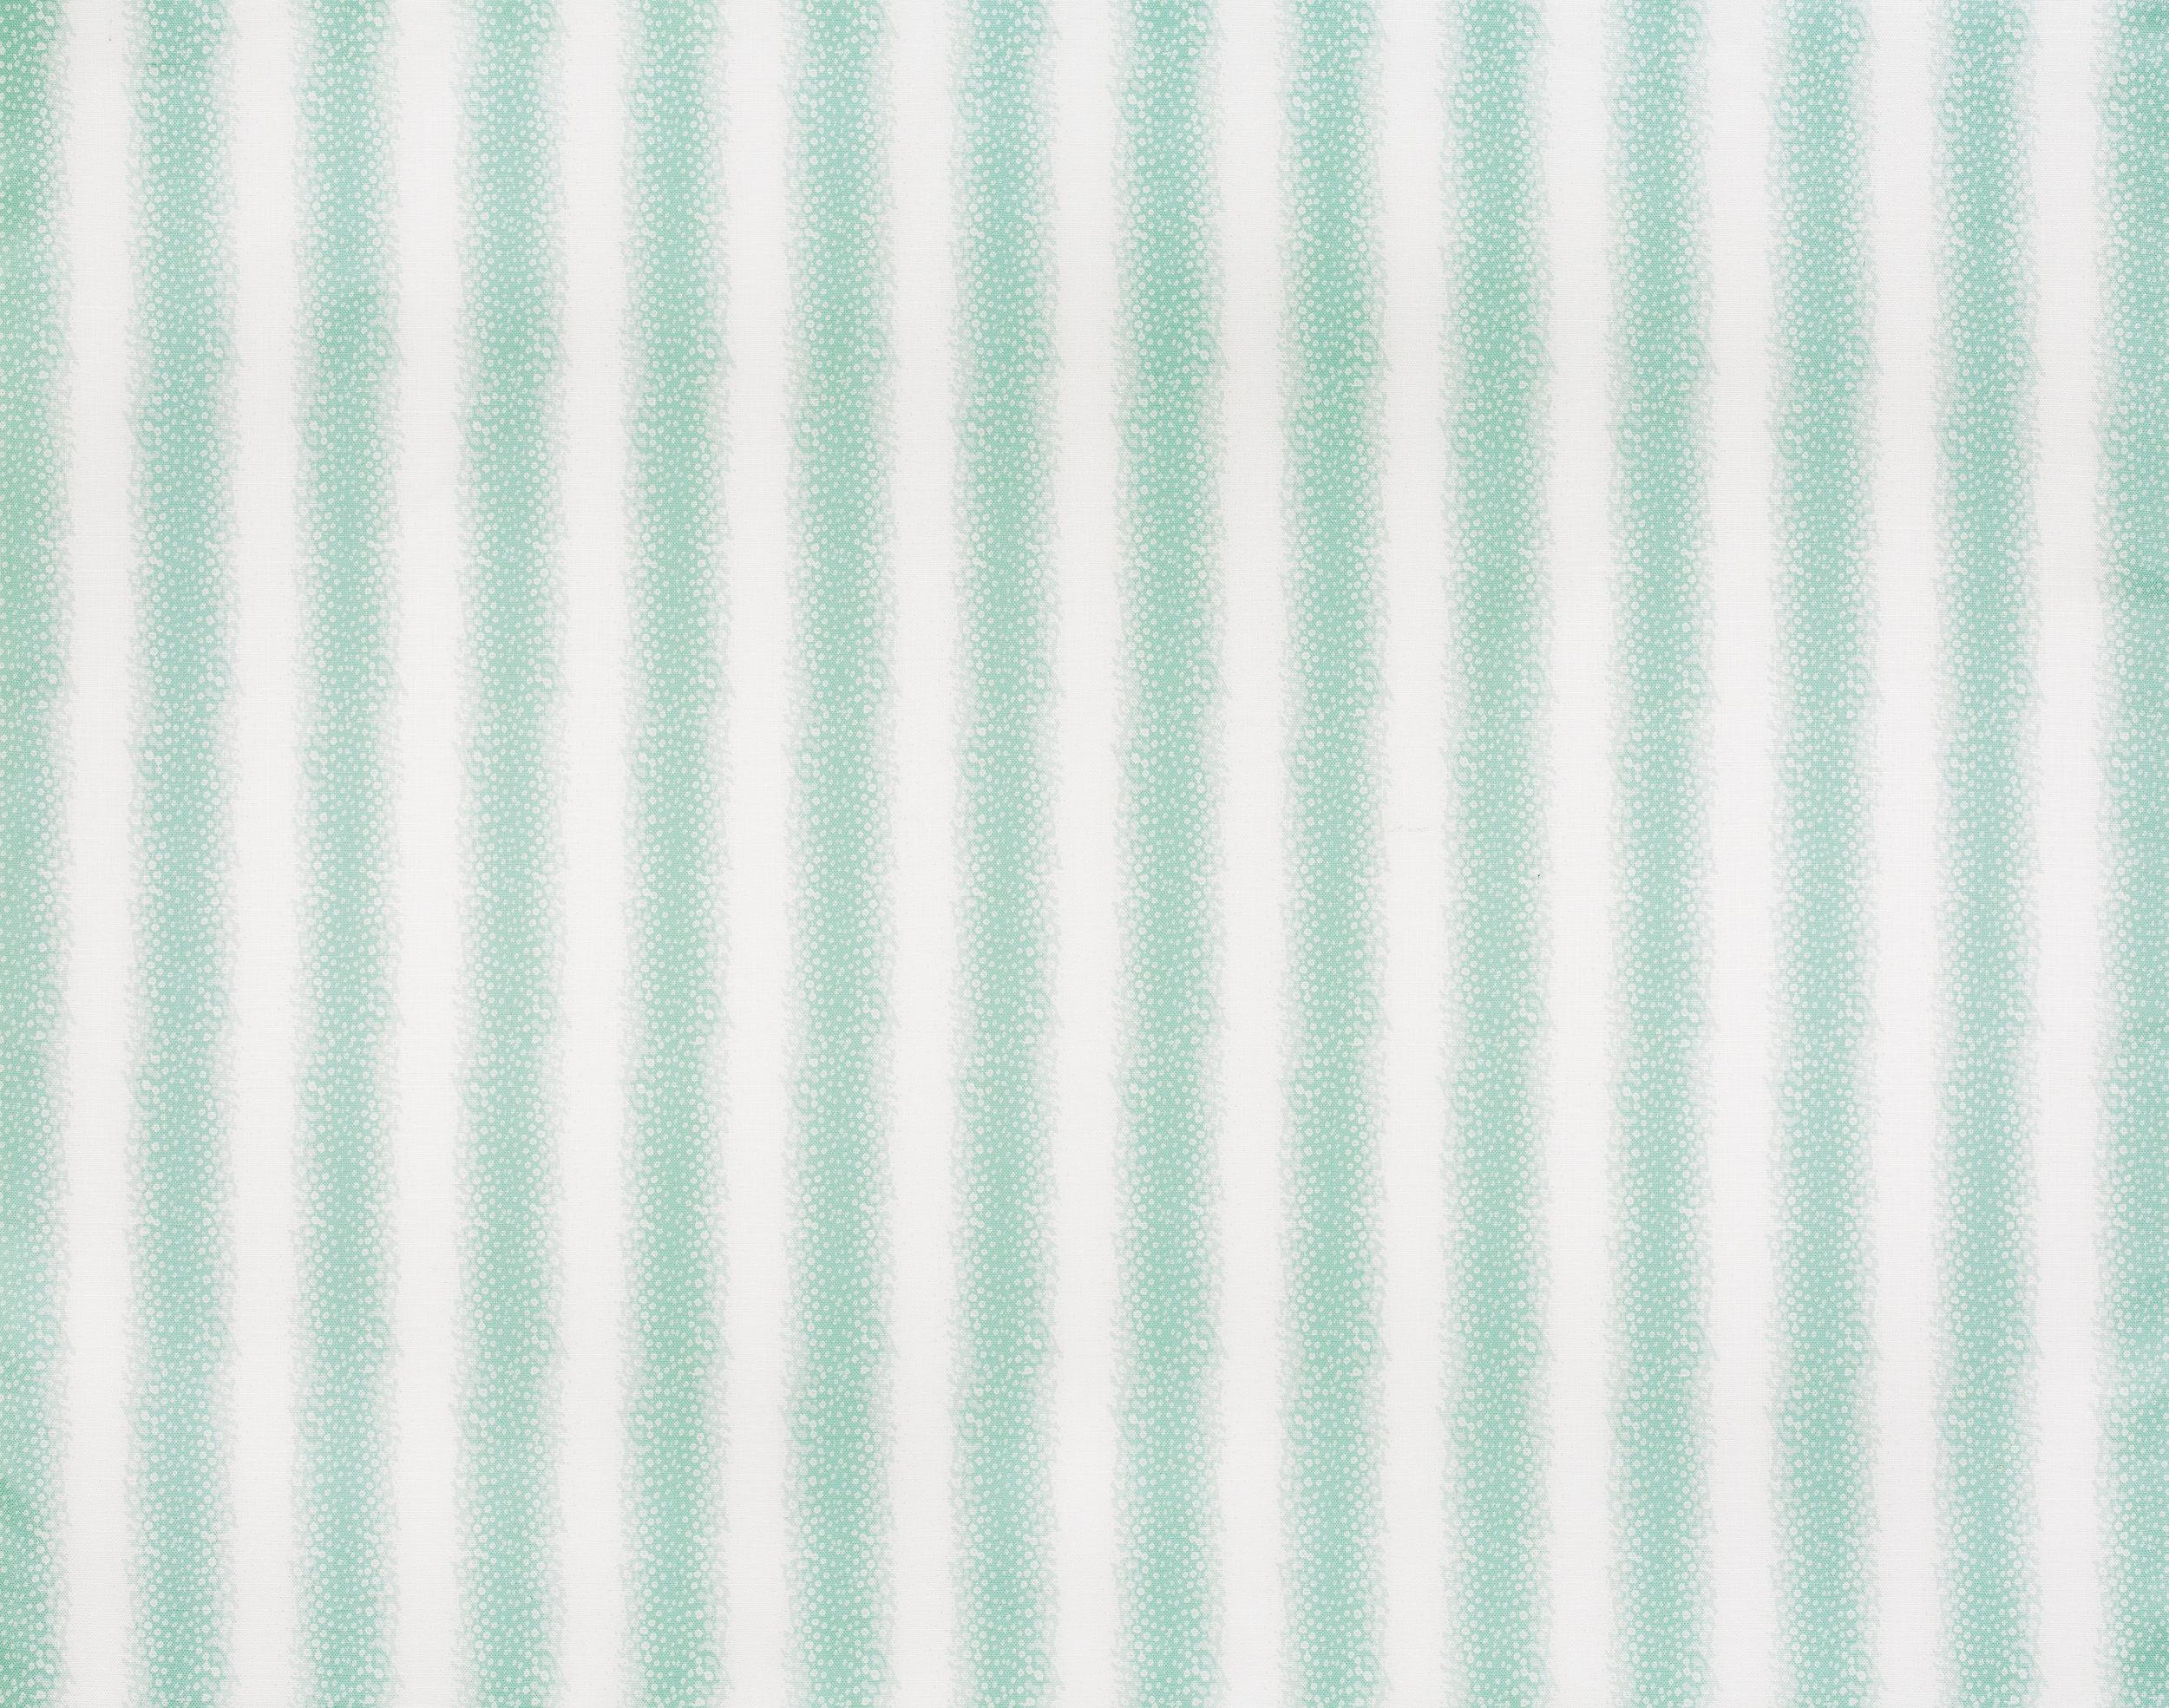 1W6A1016SpeckledStripe_Seafoam.jpg